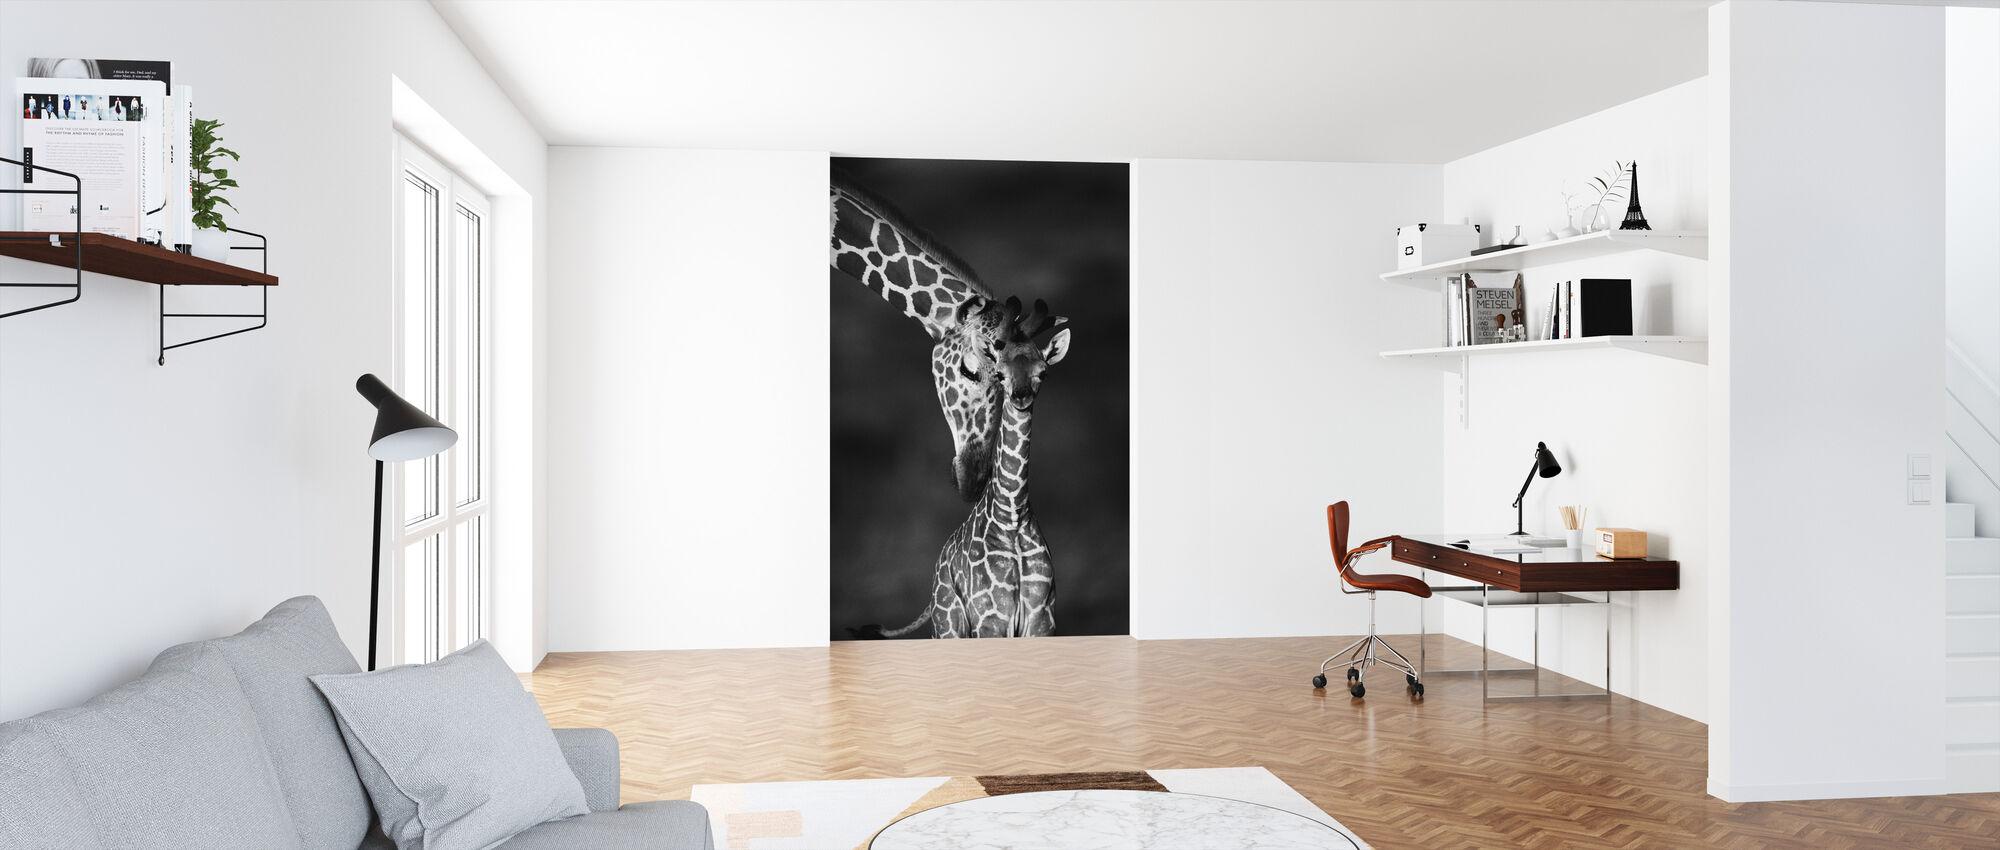 Giraffen - s/w - Tapete - Büro